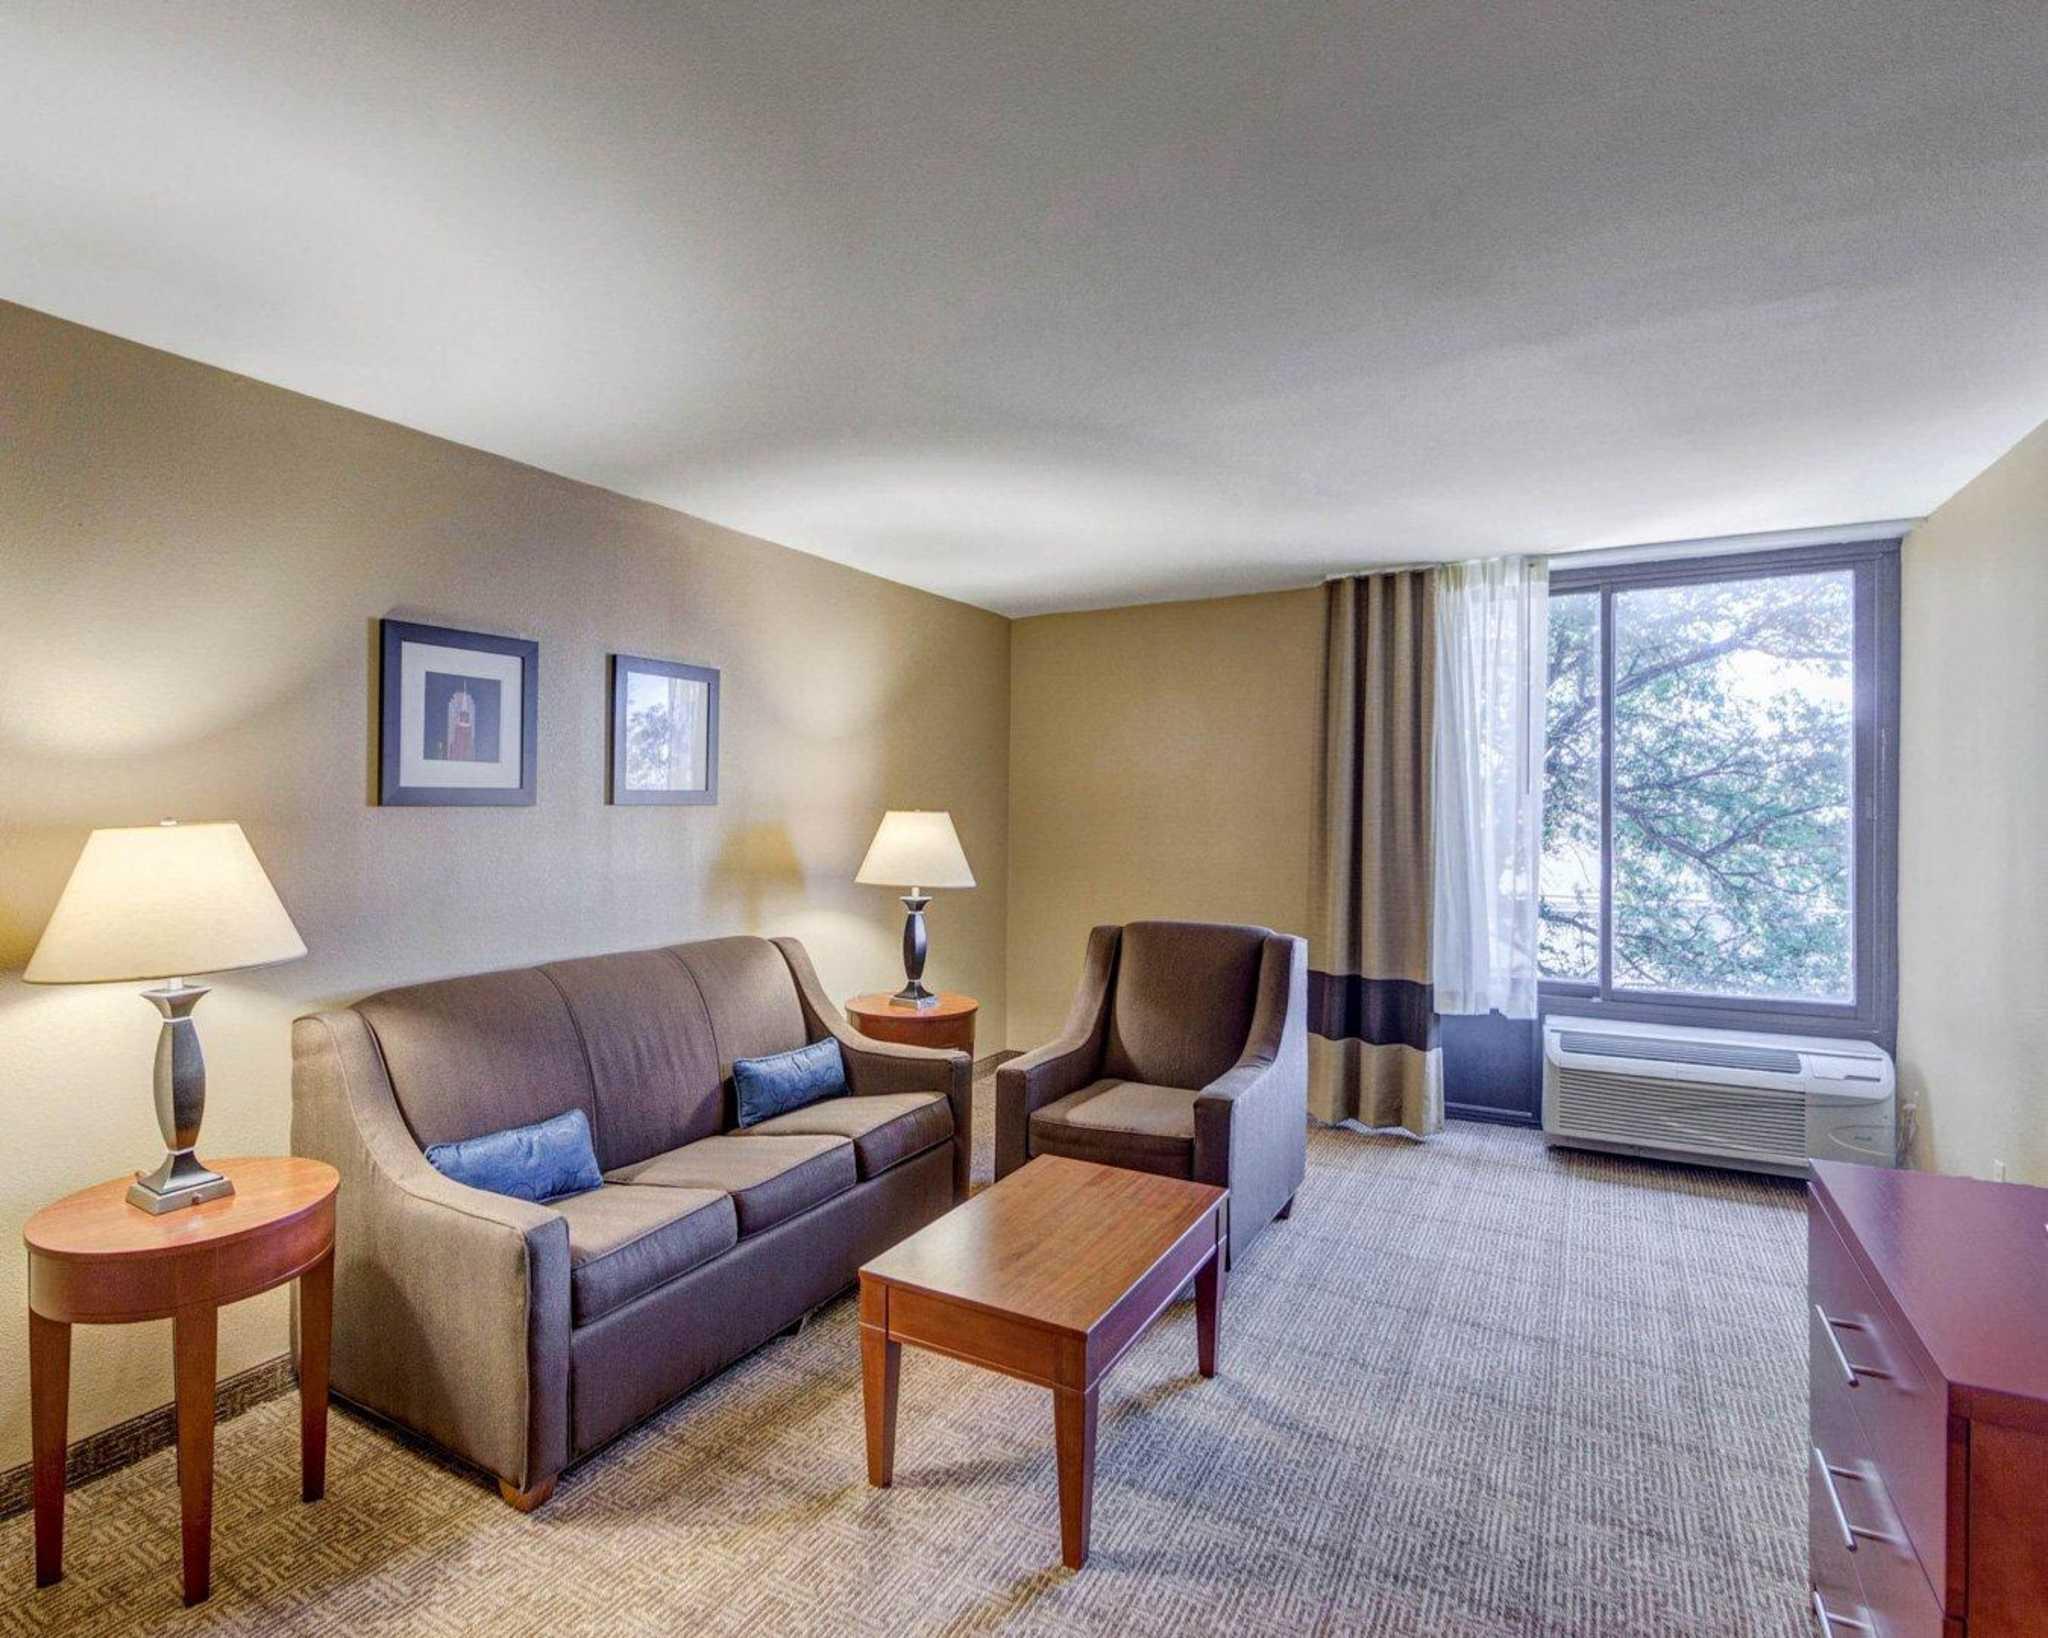 Comfort Inn & Suites Plano East image 46